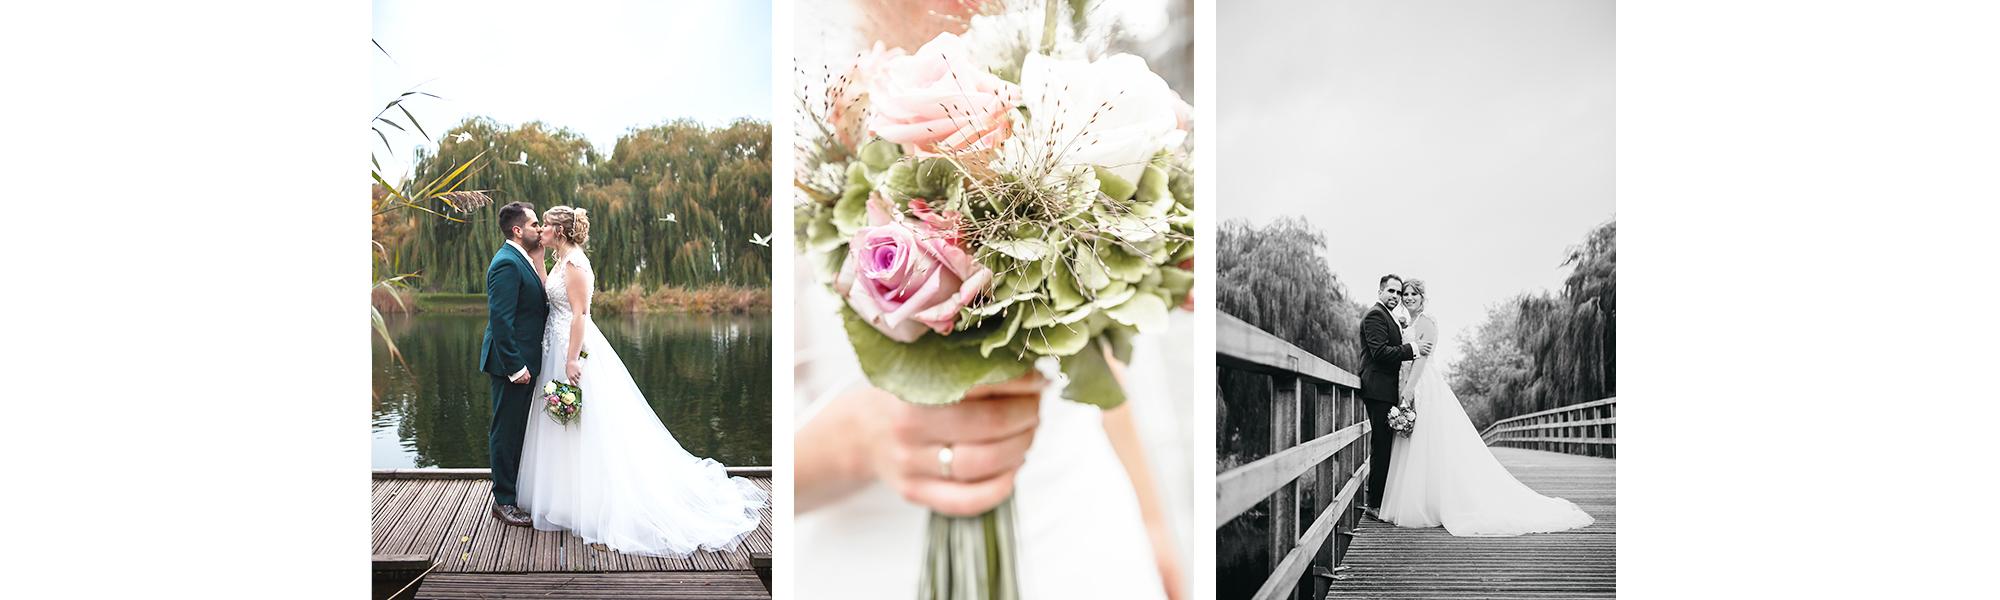 Bruidsfotografie Arrianne Rijnaard